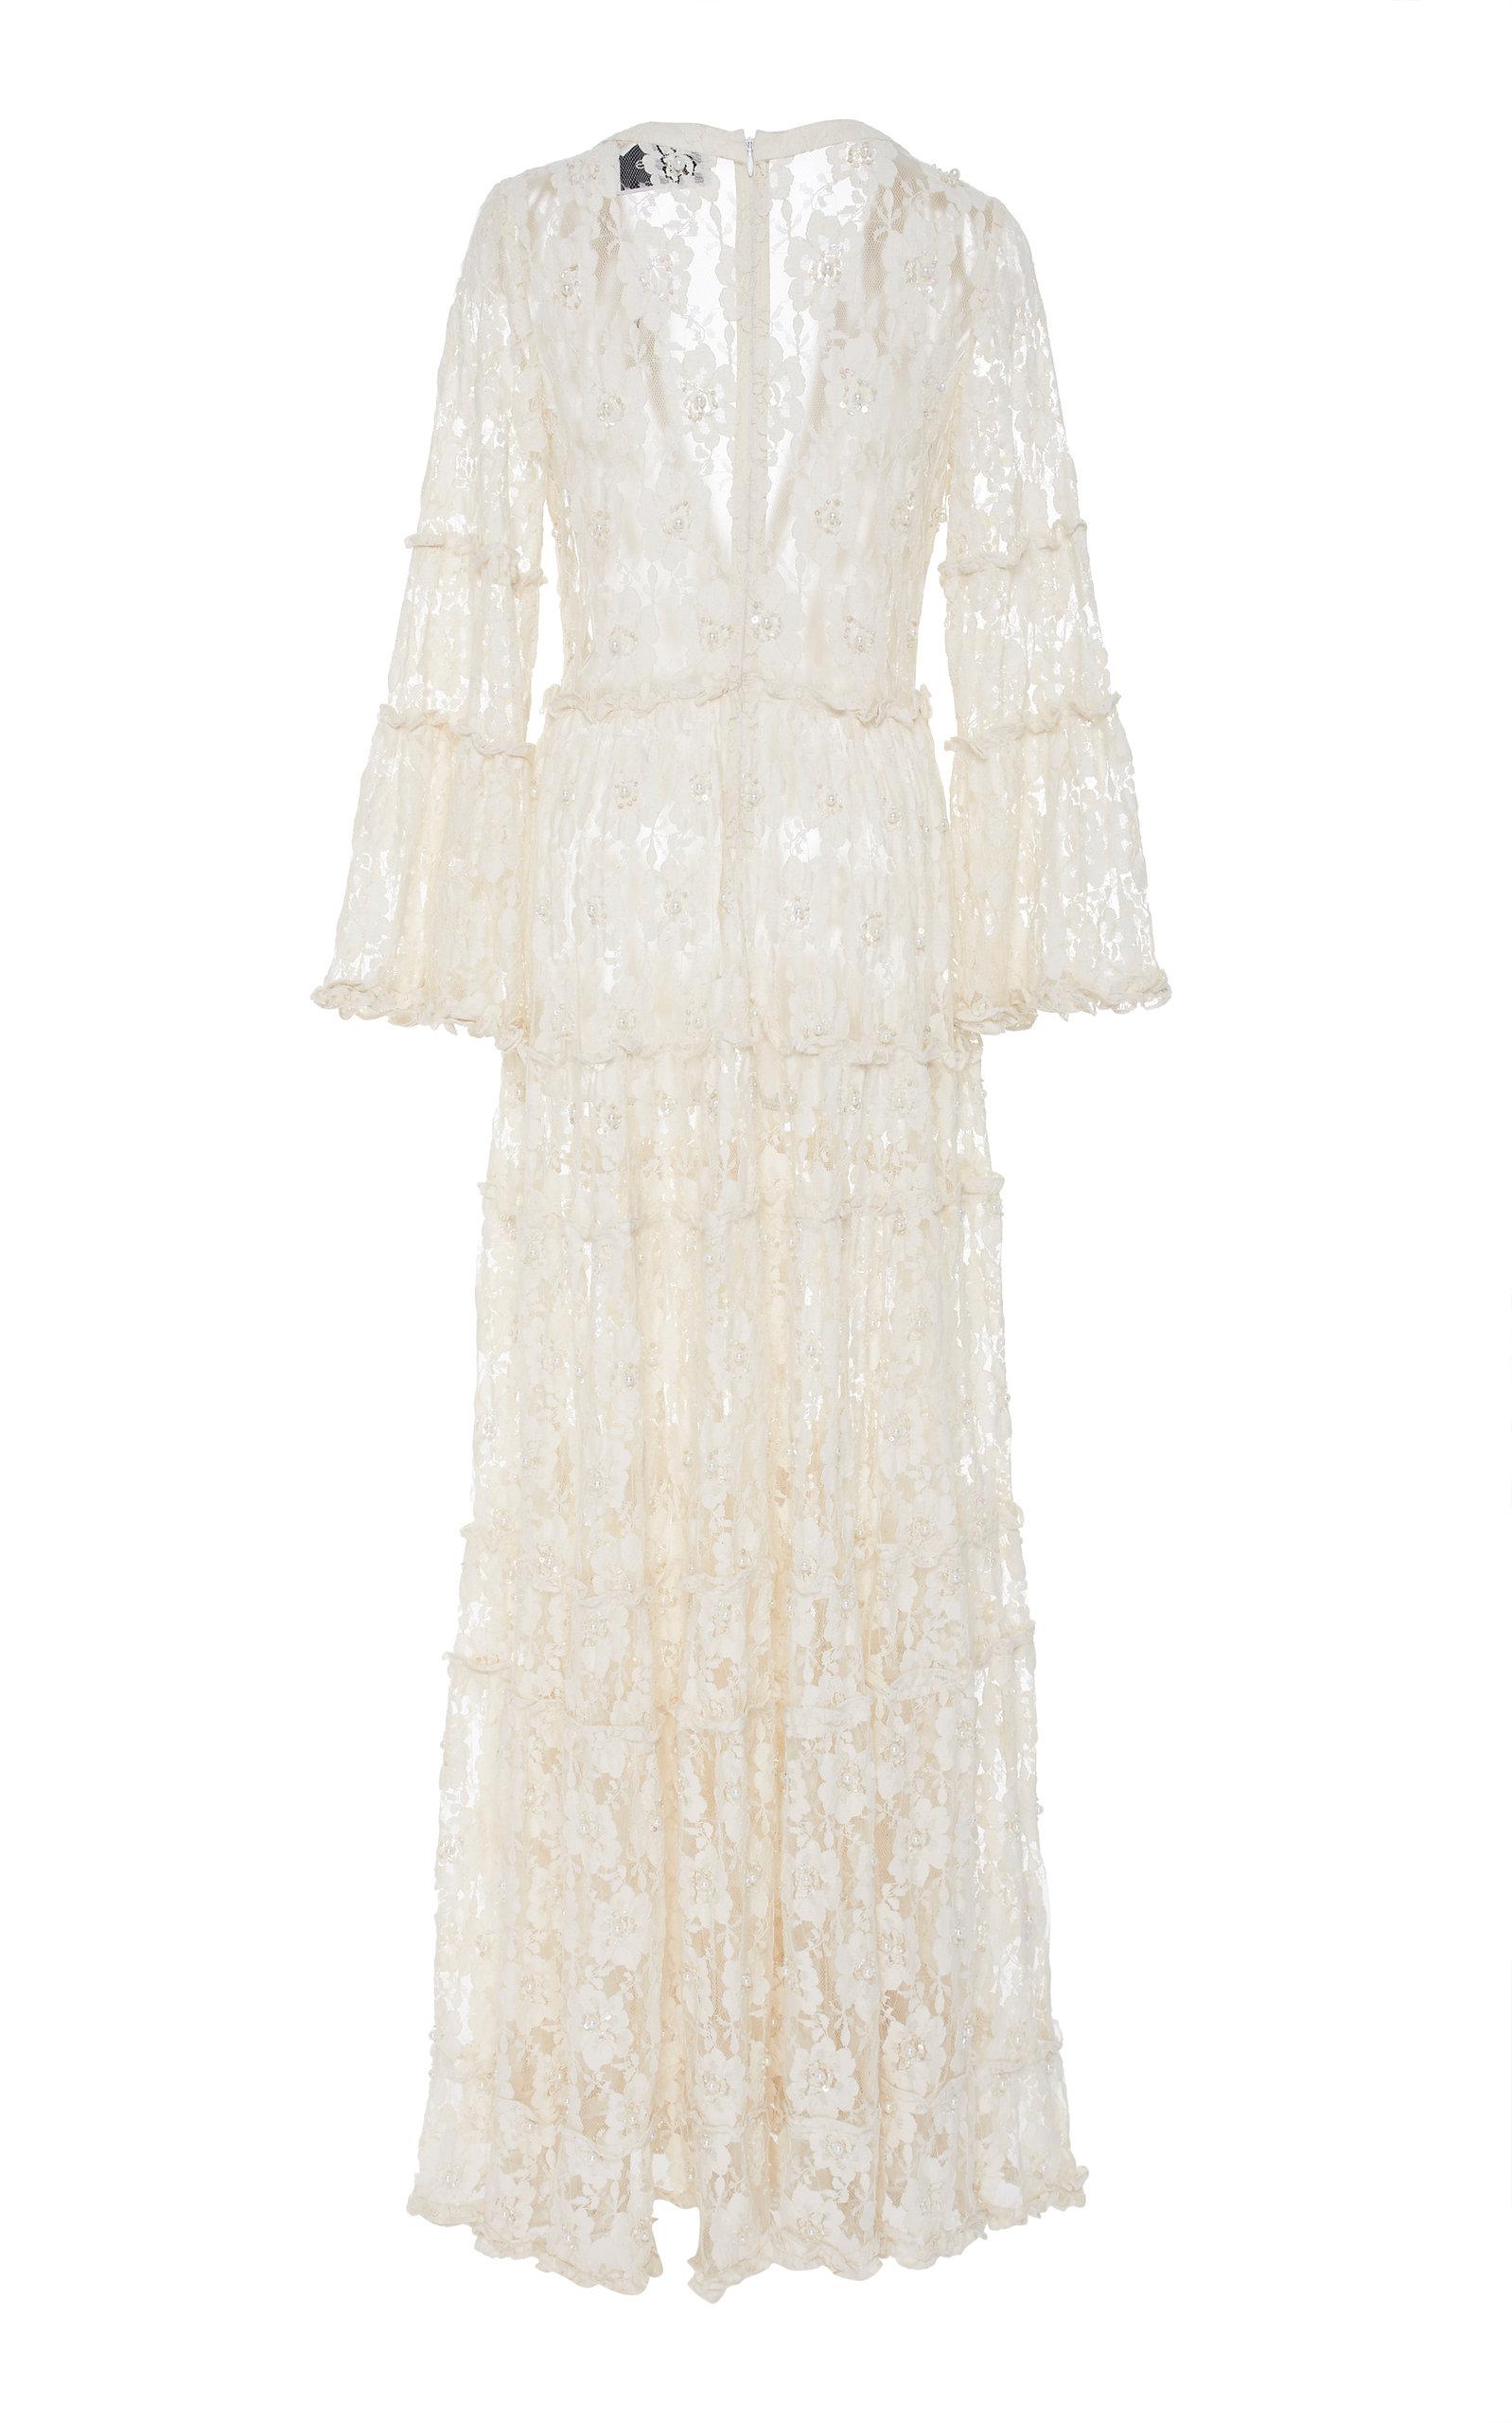 7ce78e0c0668 Alvin Beaded Lace Maxi Dress by Alexis | Moda Operandi